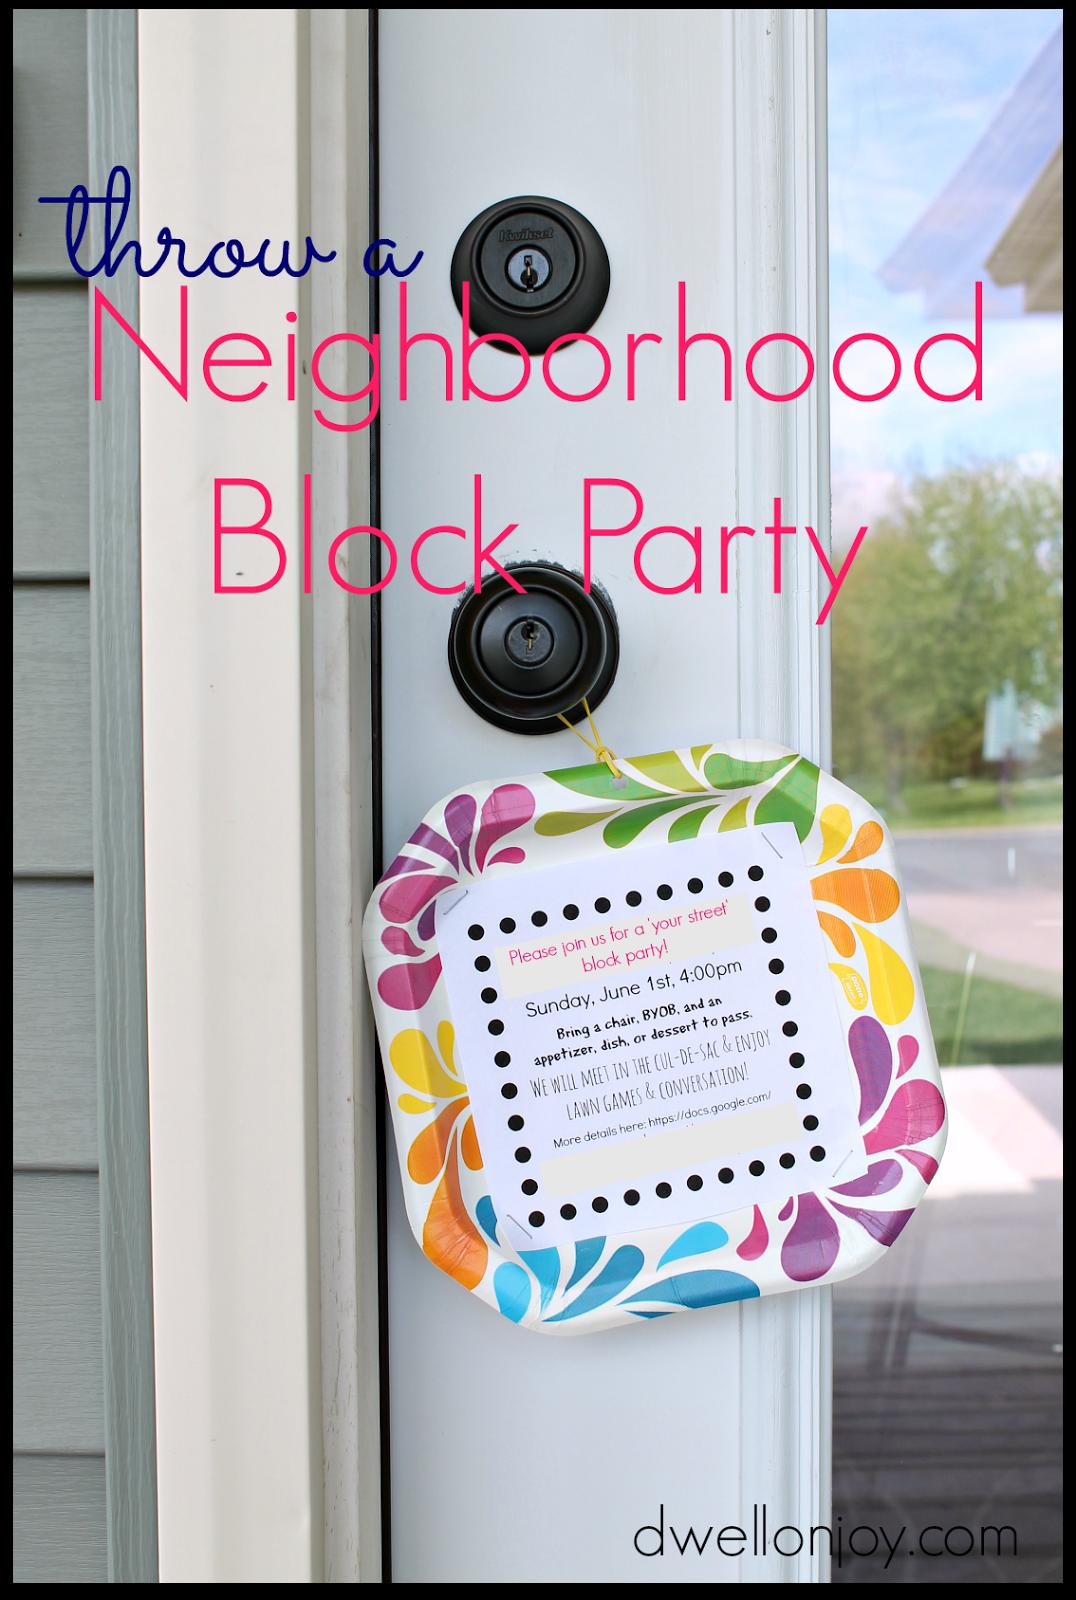 Neighborhood Block Party Invitations | Dwell on Joy - this simple ...